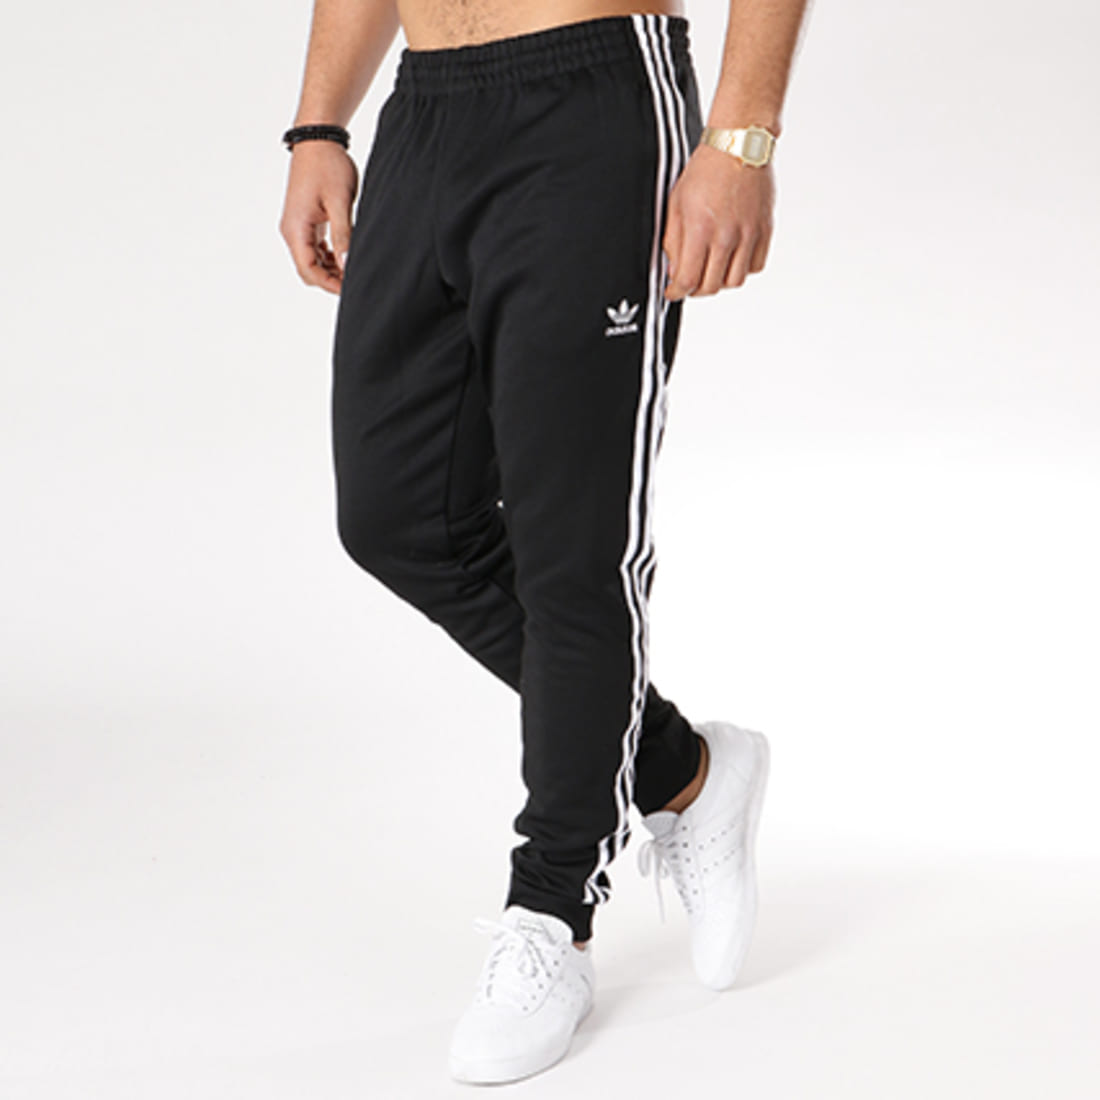 Hombre repertorio Puede ser ignorado  adidas - Pantalon Jogging Bandes Brodées SST CW1275 Noir Blanc -  LaBoutiqueOfficielle.com